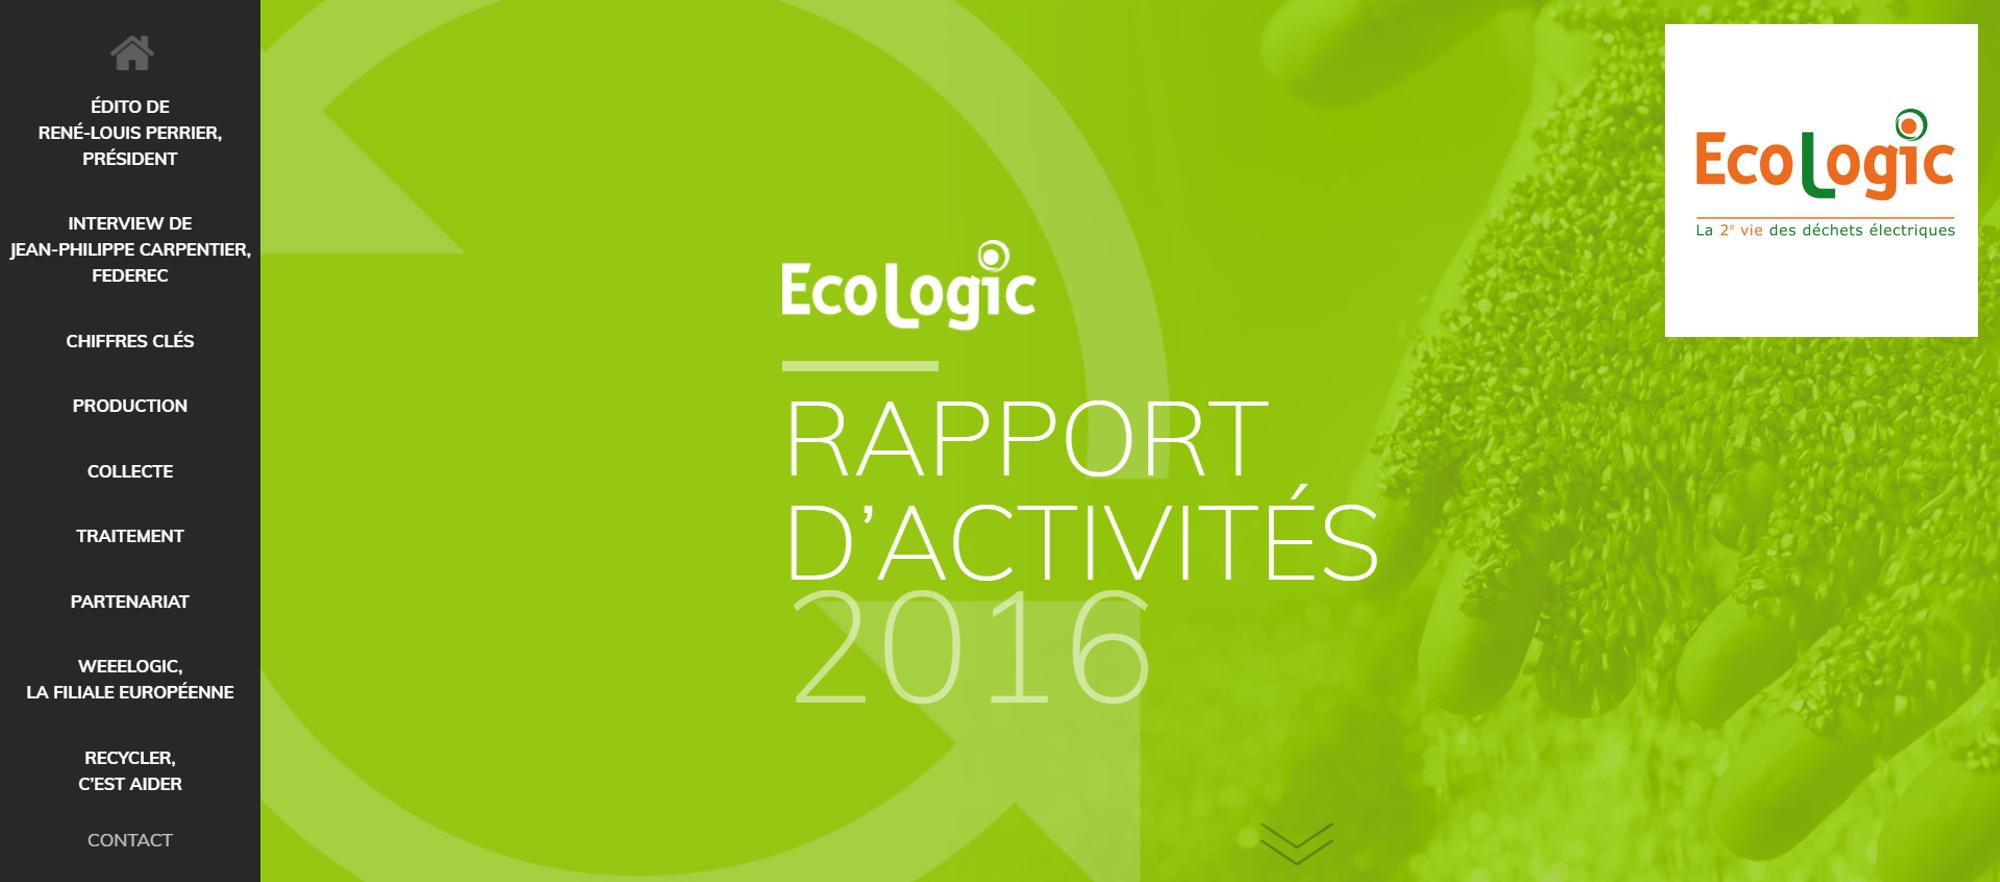 annual report ecologic 2016